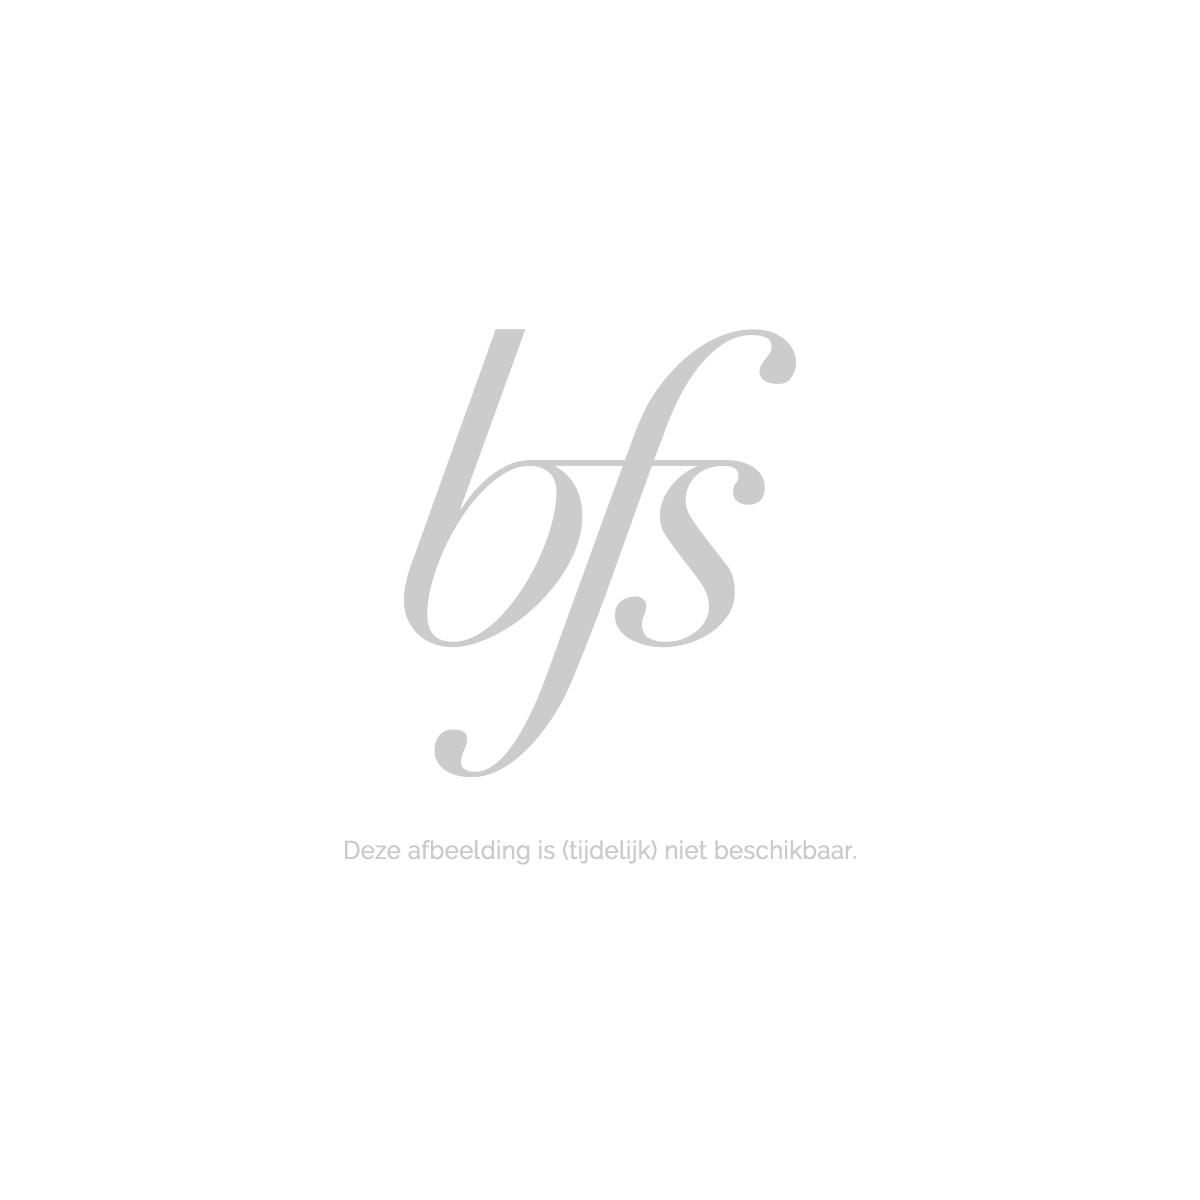 Givenchy Organza Eau De Parfum Spray (1) 100 Ml